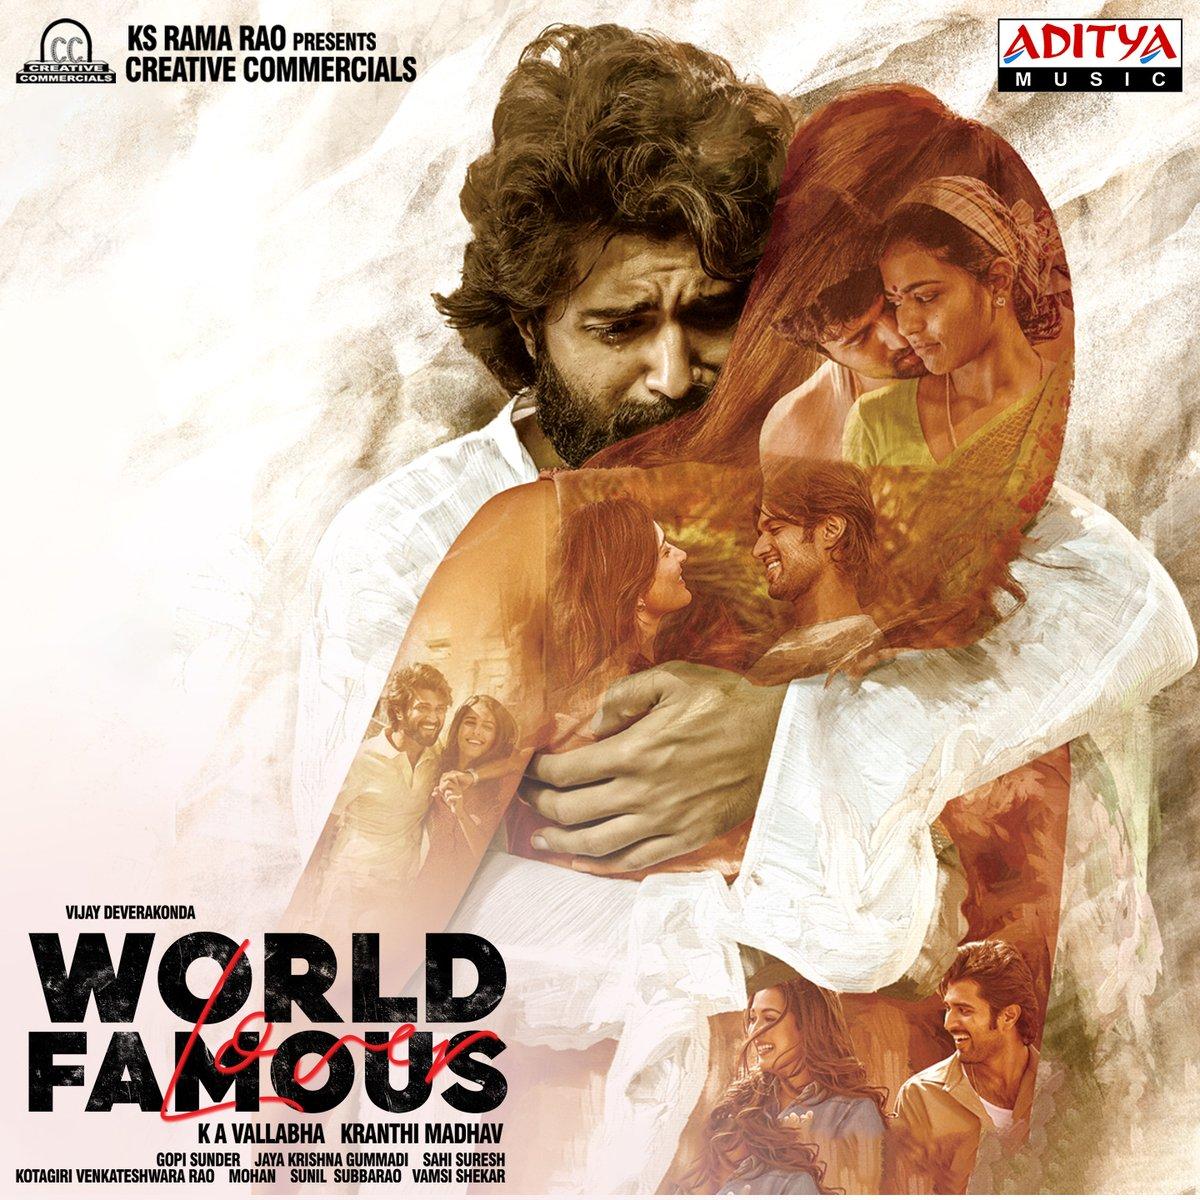 World famous songs from the album World famous lover. Listen now➡️  @TheDeverakonda @GopiSundarOffl @RaashiKhanna @CatherineTresa1 @izabelleleite25 @aishu_dil @srikrisin @adityamusic @CCMediaEnt #WorldFamousLover